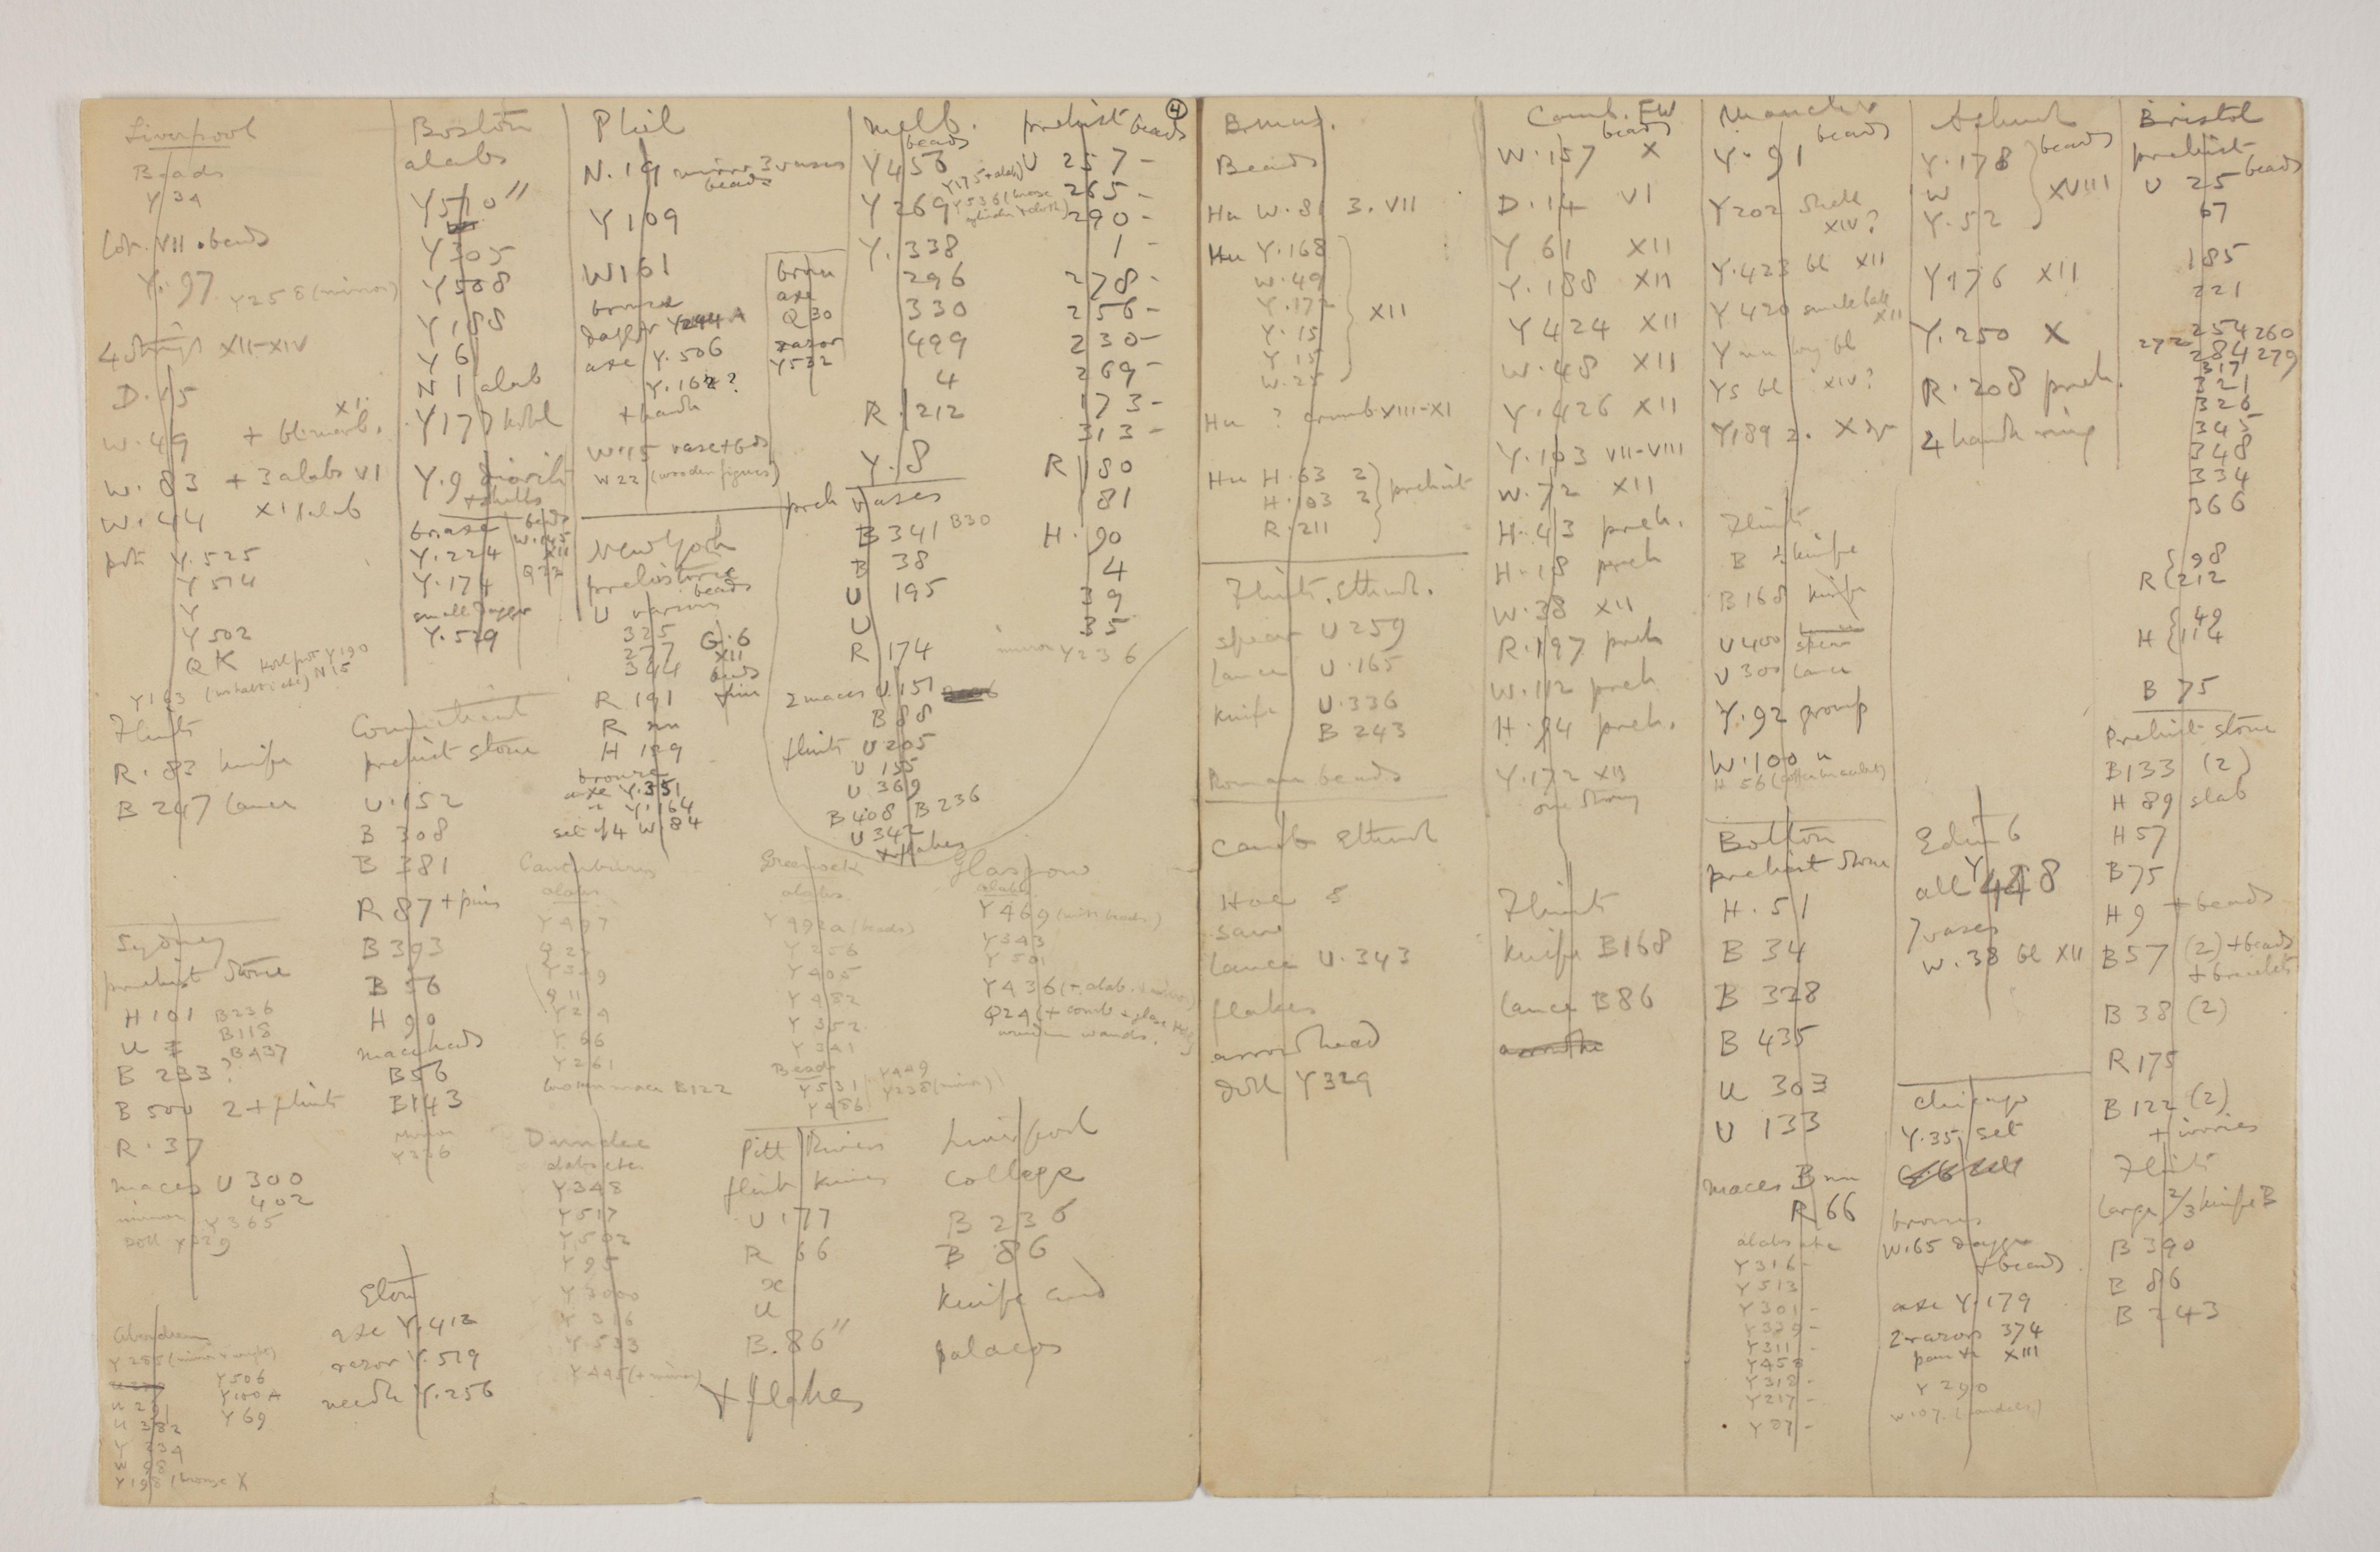 1898-99 Hu, Faiyum, Deir el-Bahri Distribution grid PMA/WFP1/D/7/4.1